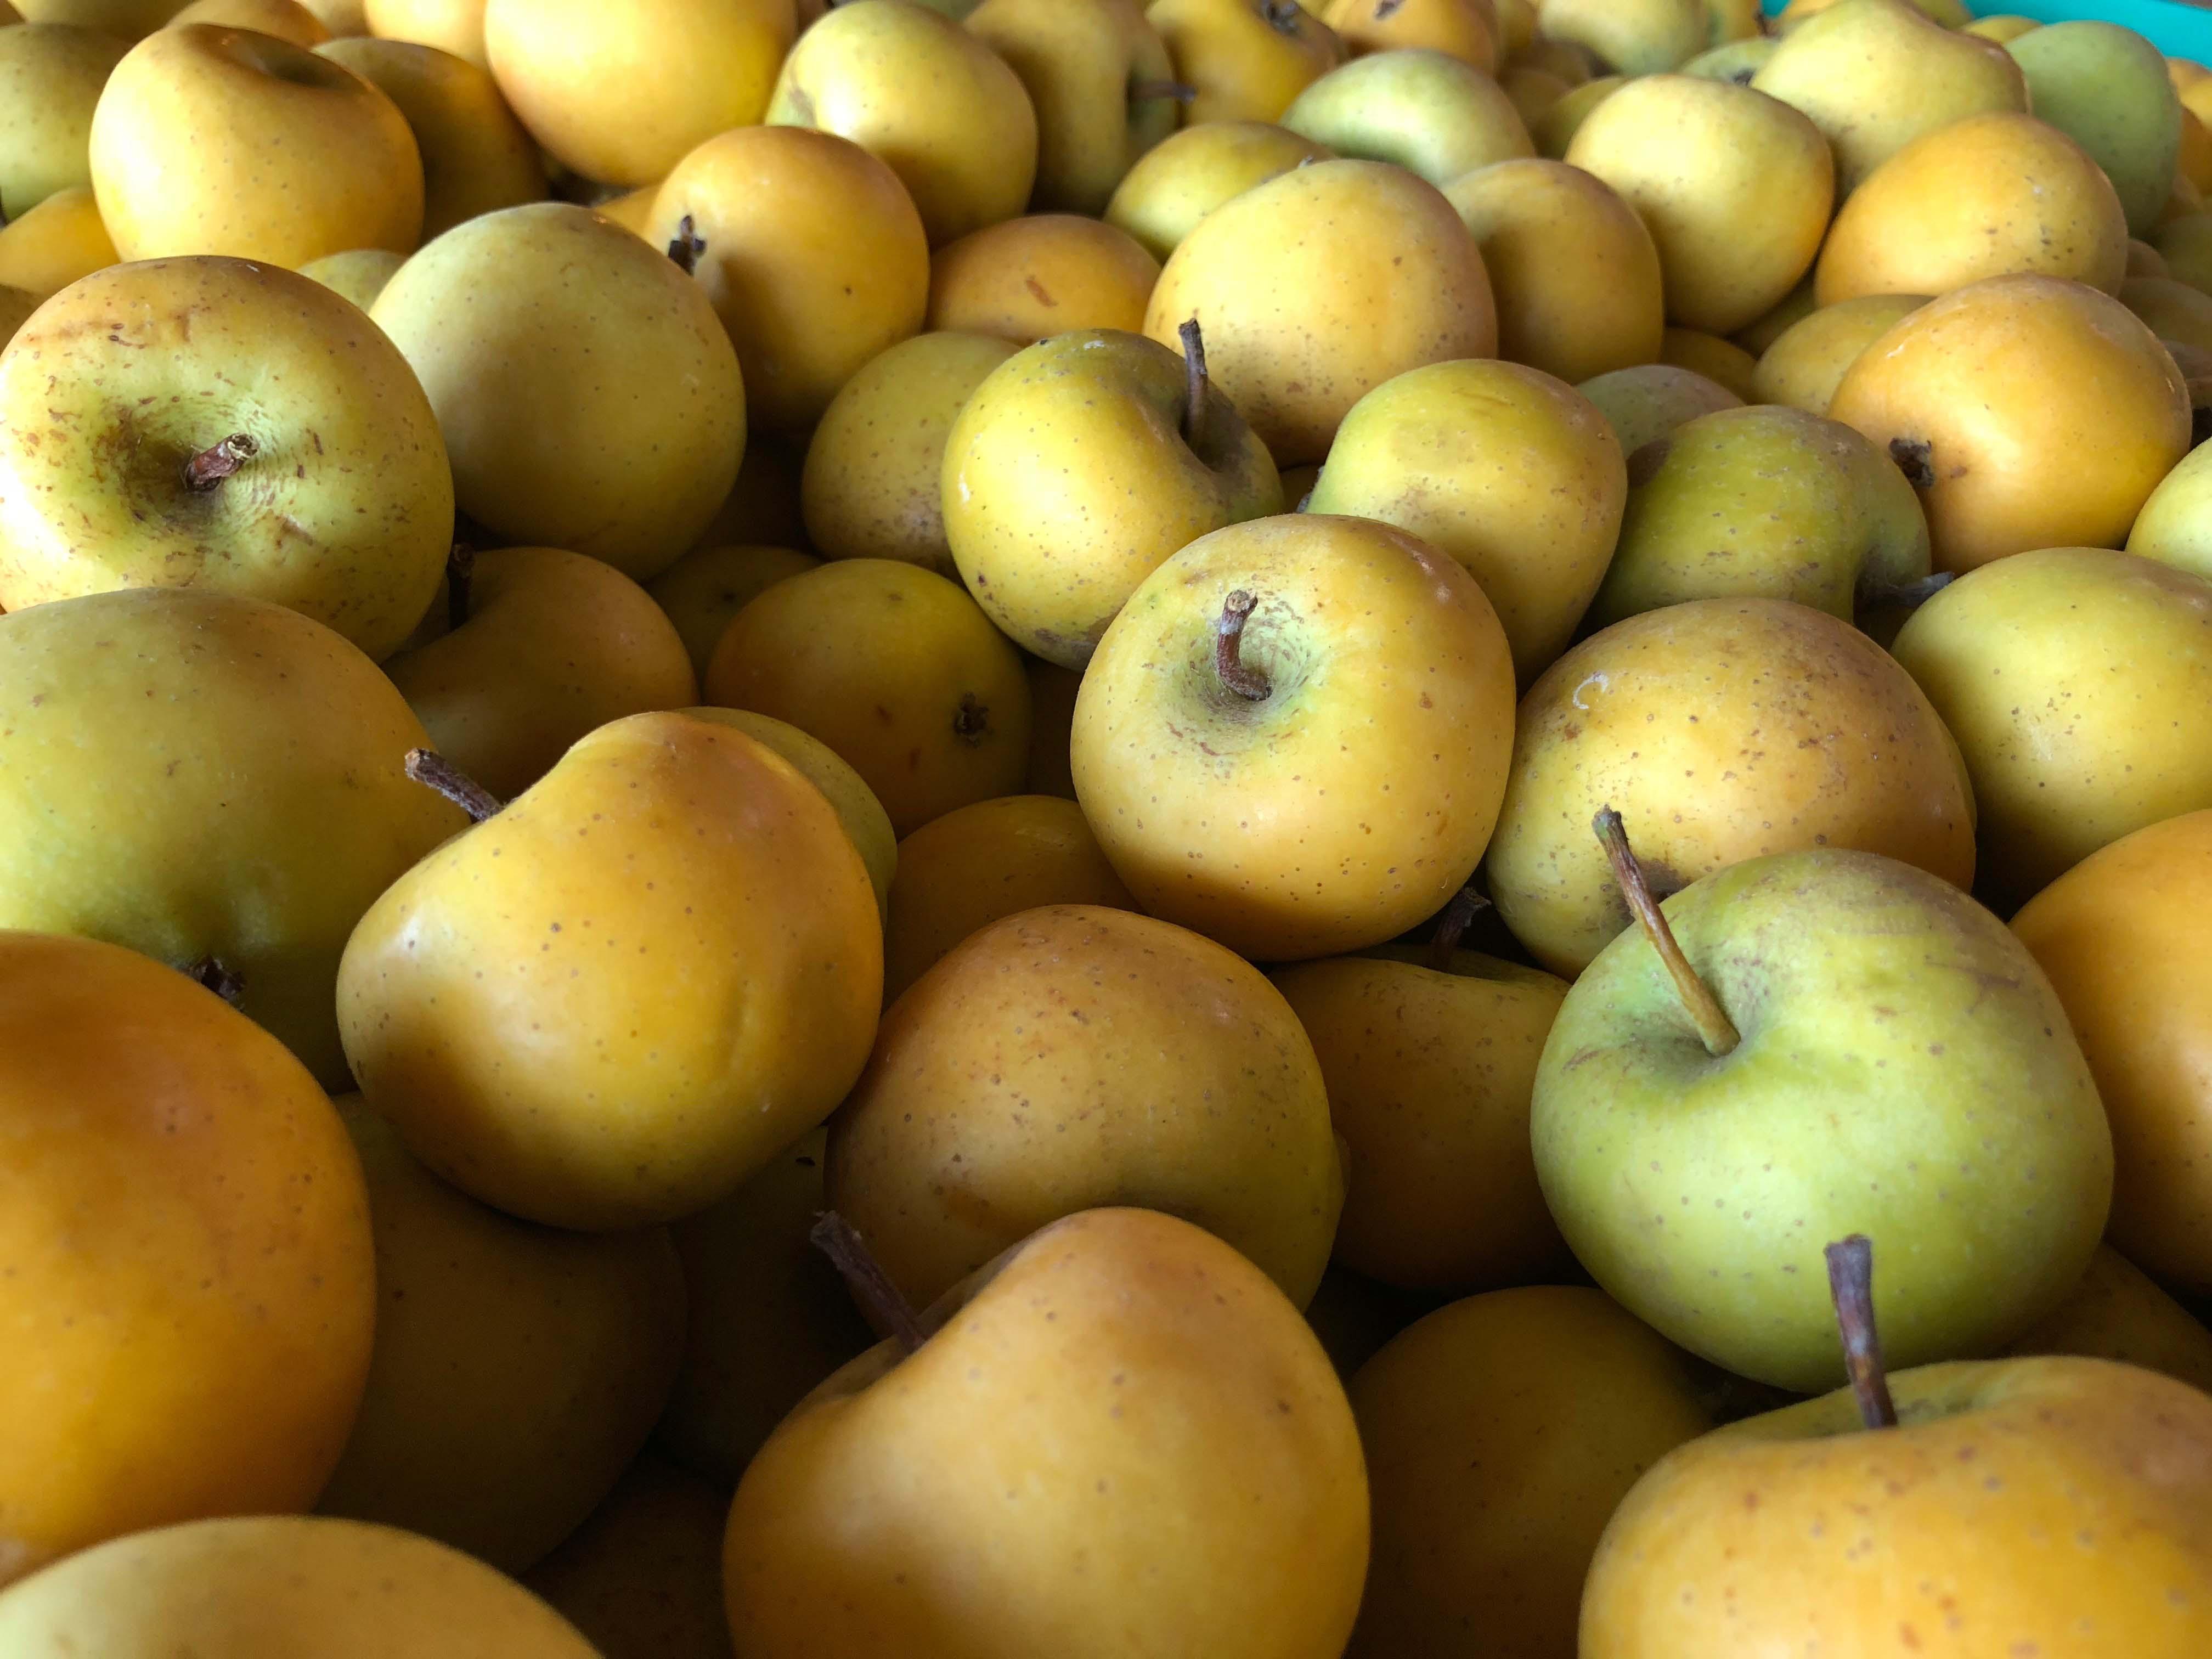 Virginia apples, cider